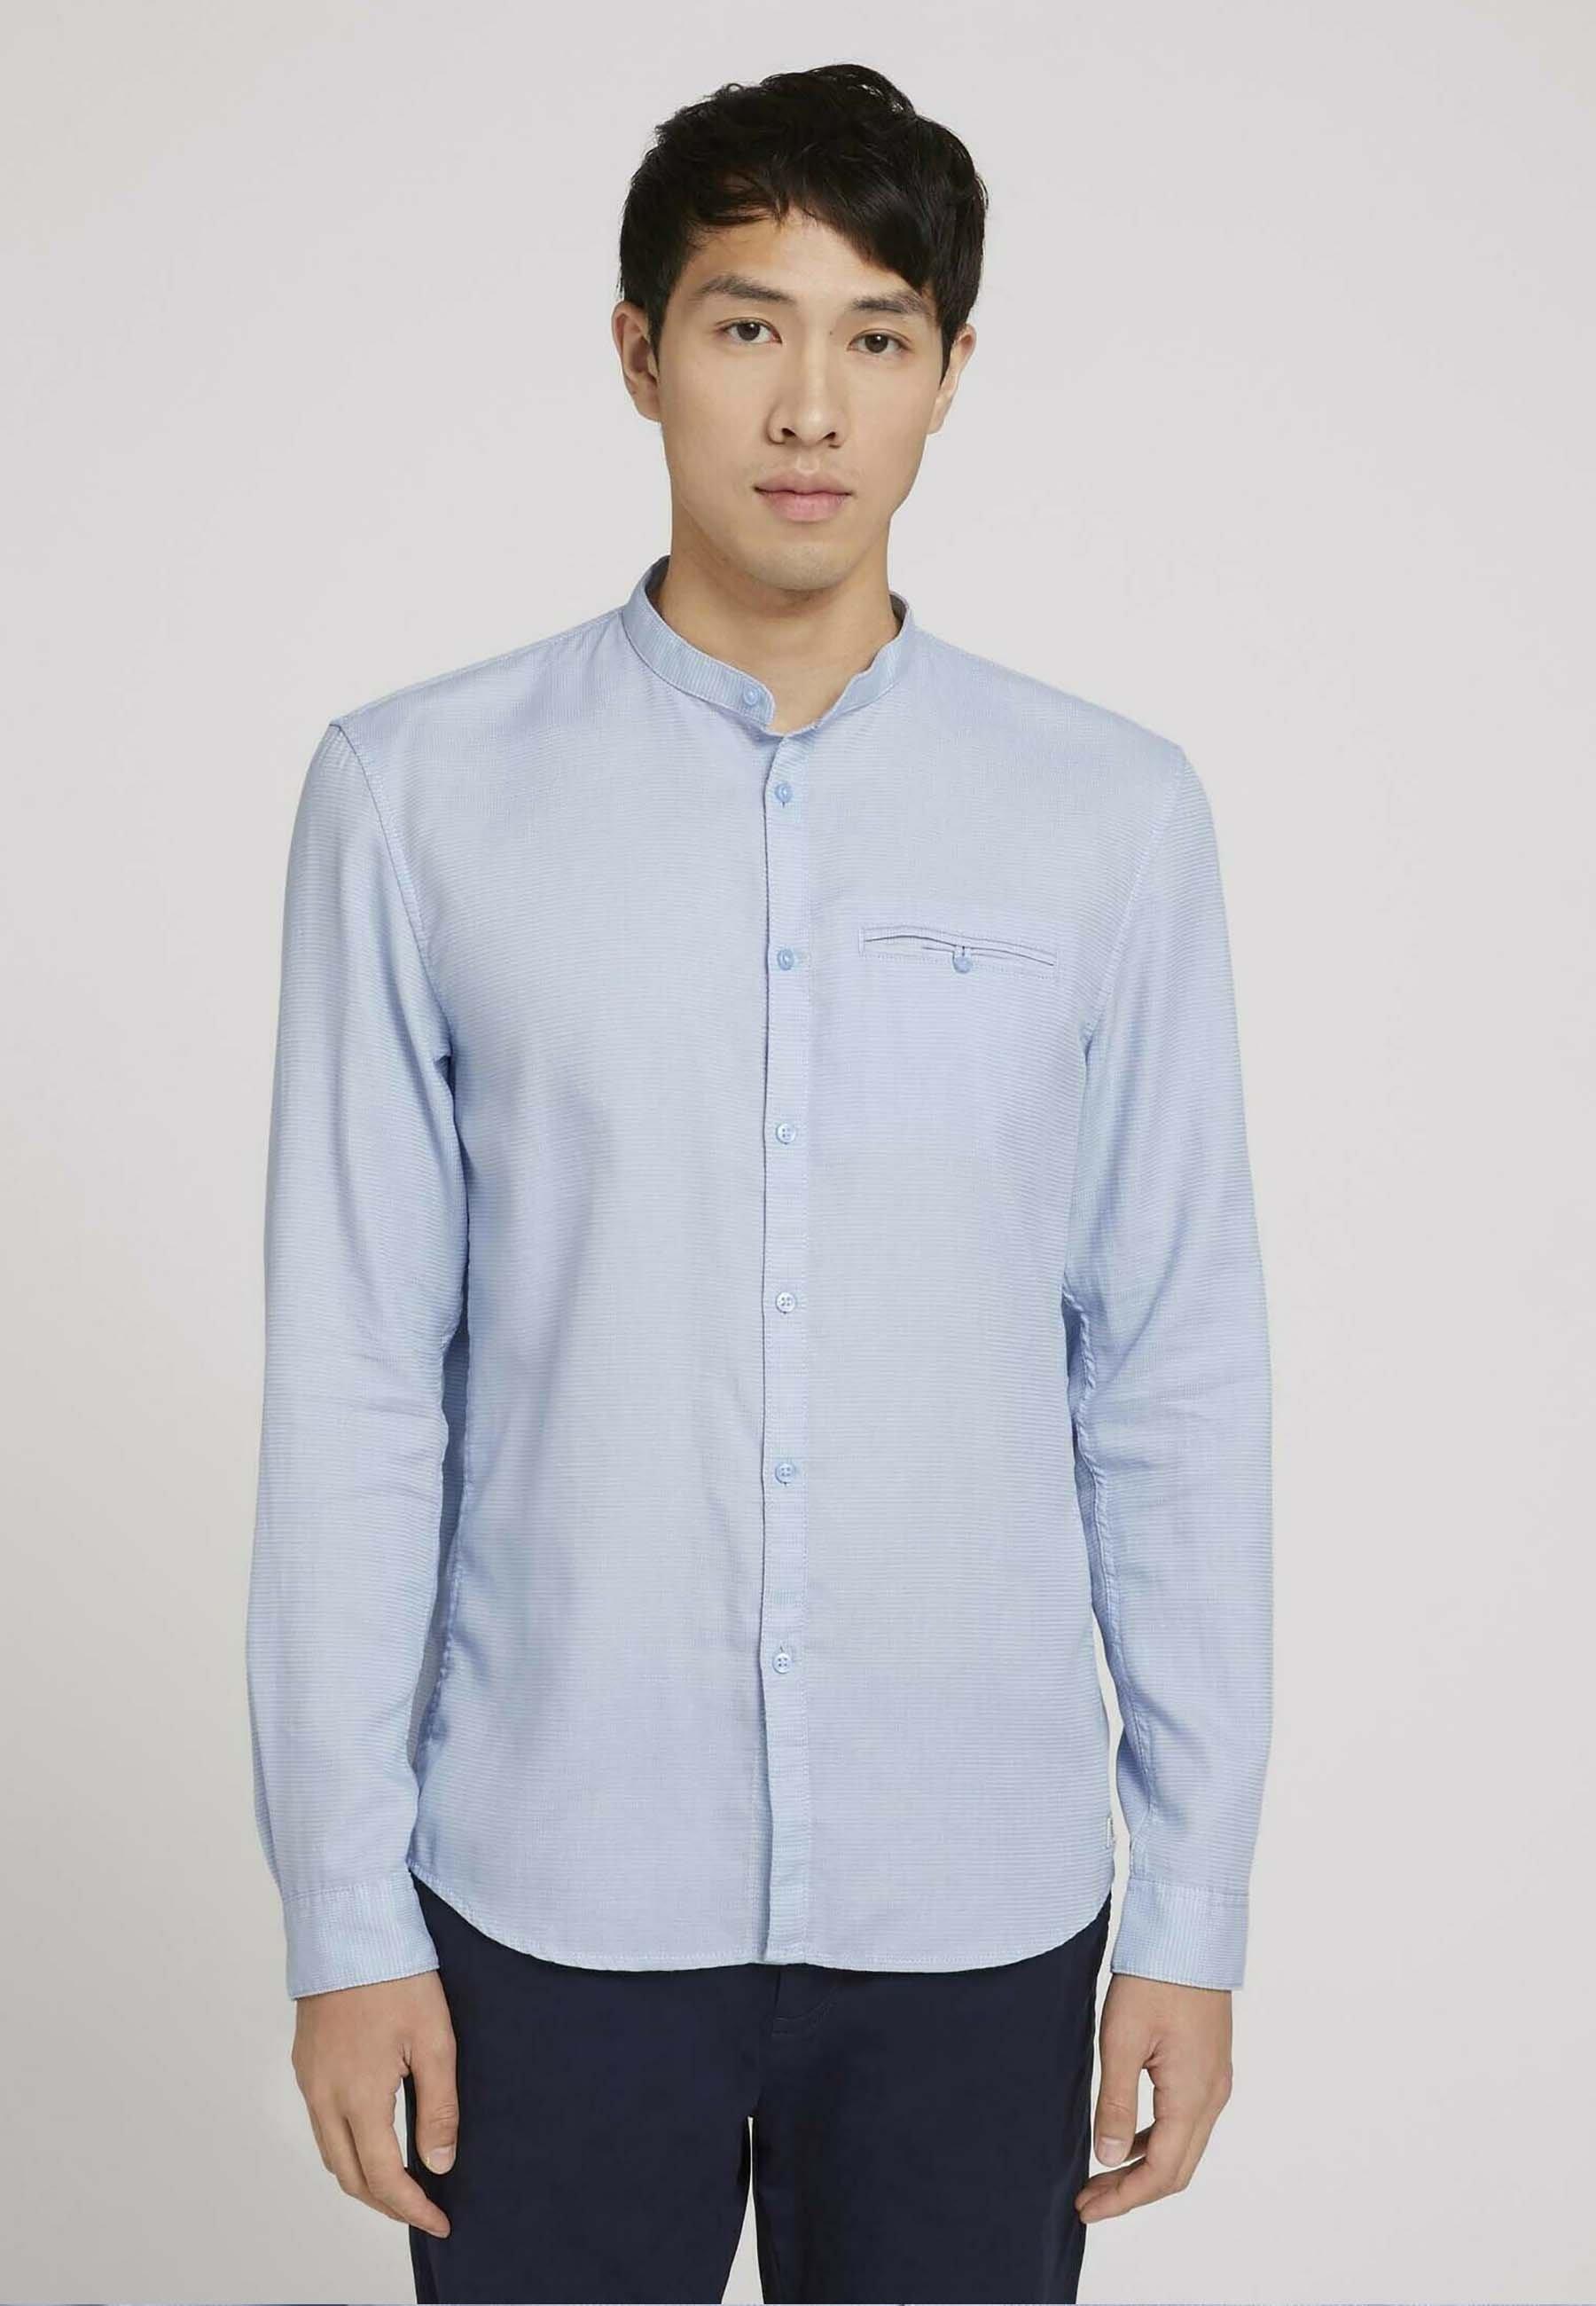 Uomo Camicia - lightblue white